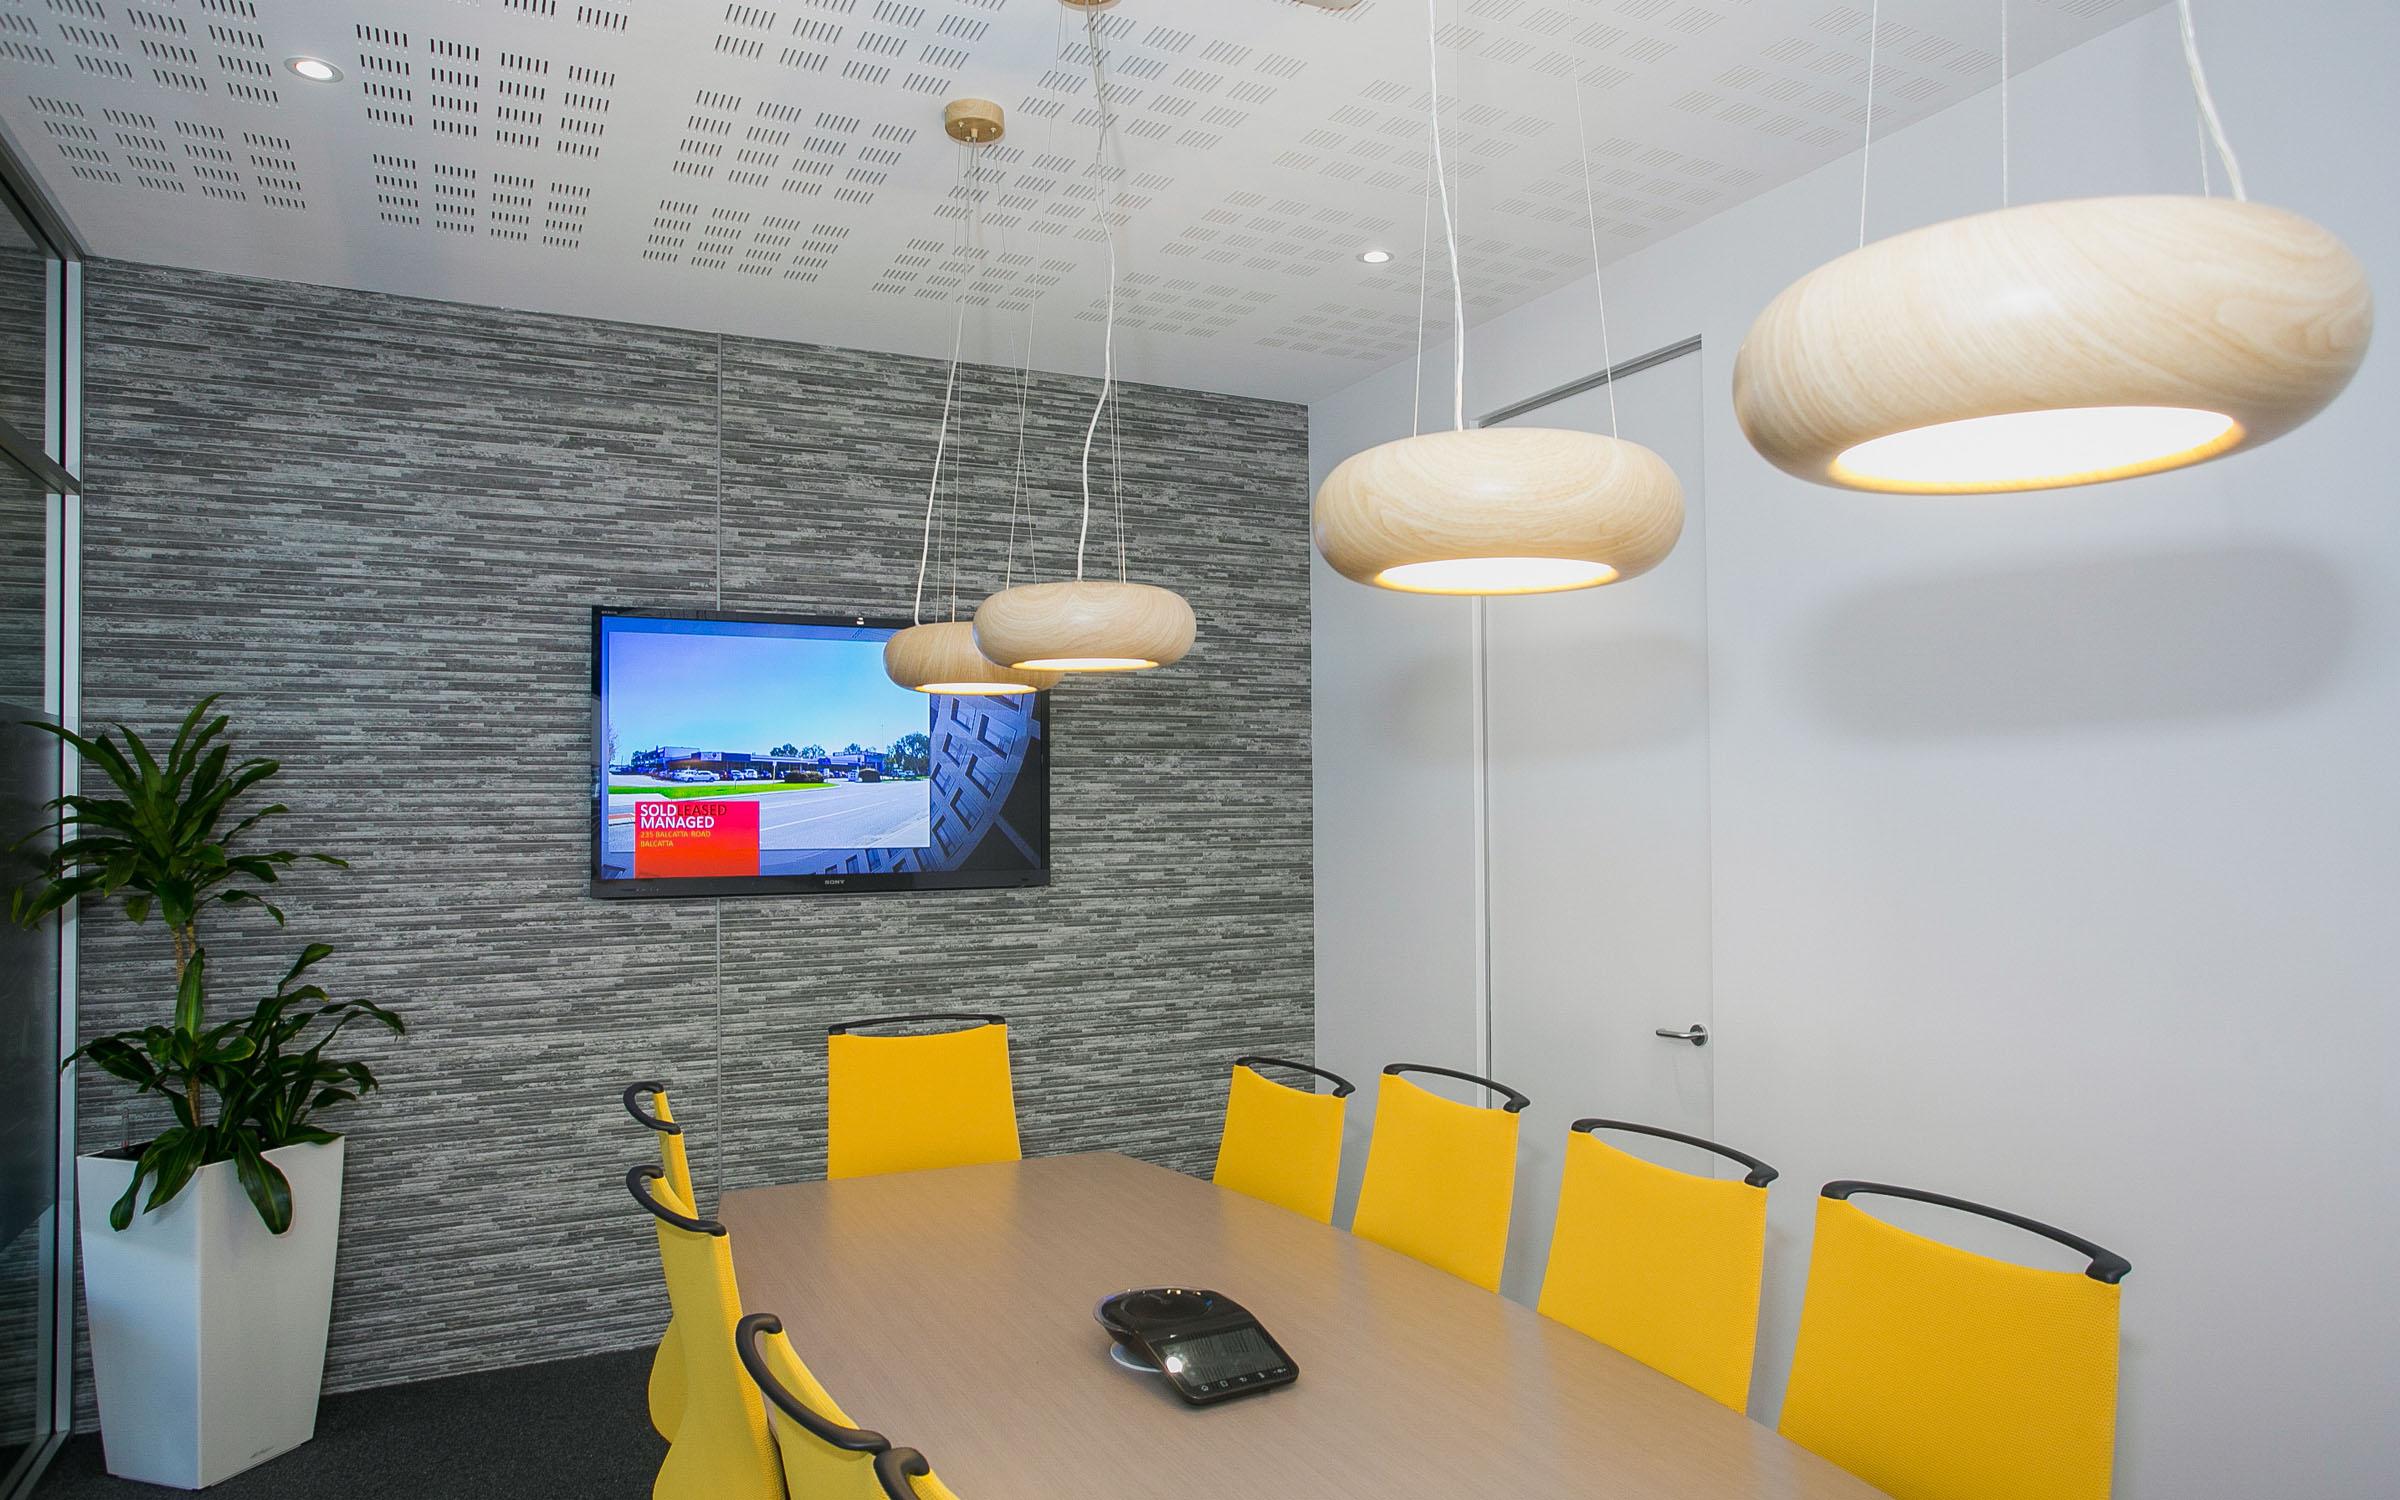 Commercial Ceiling Tiles Sydney Review Home Decor